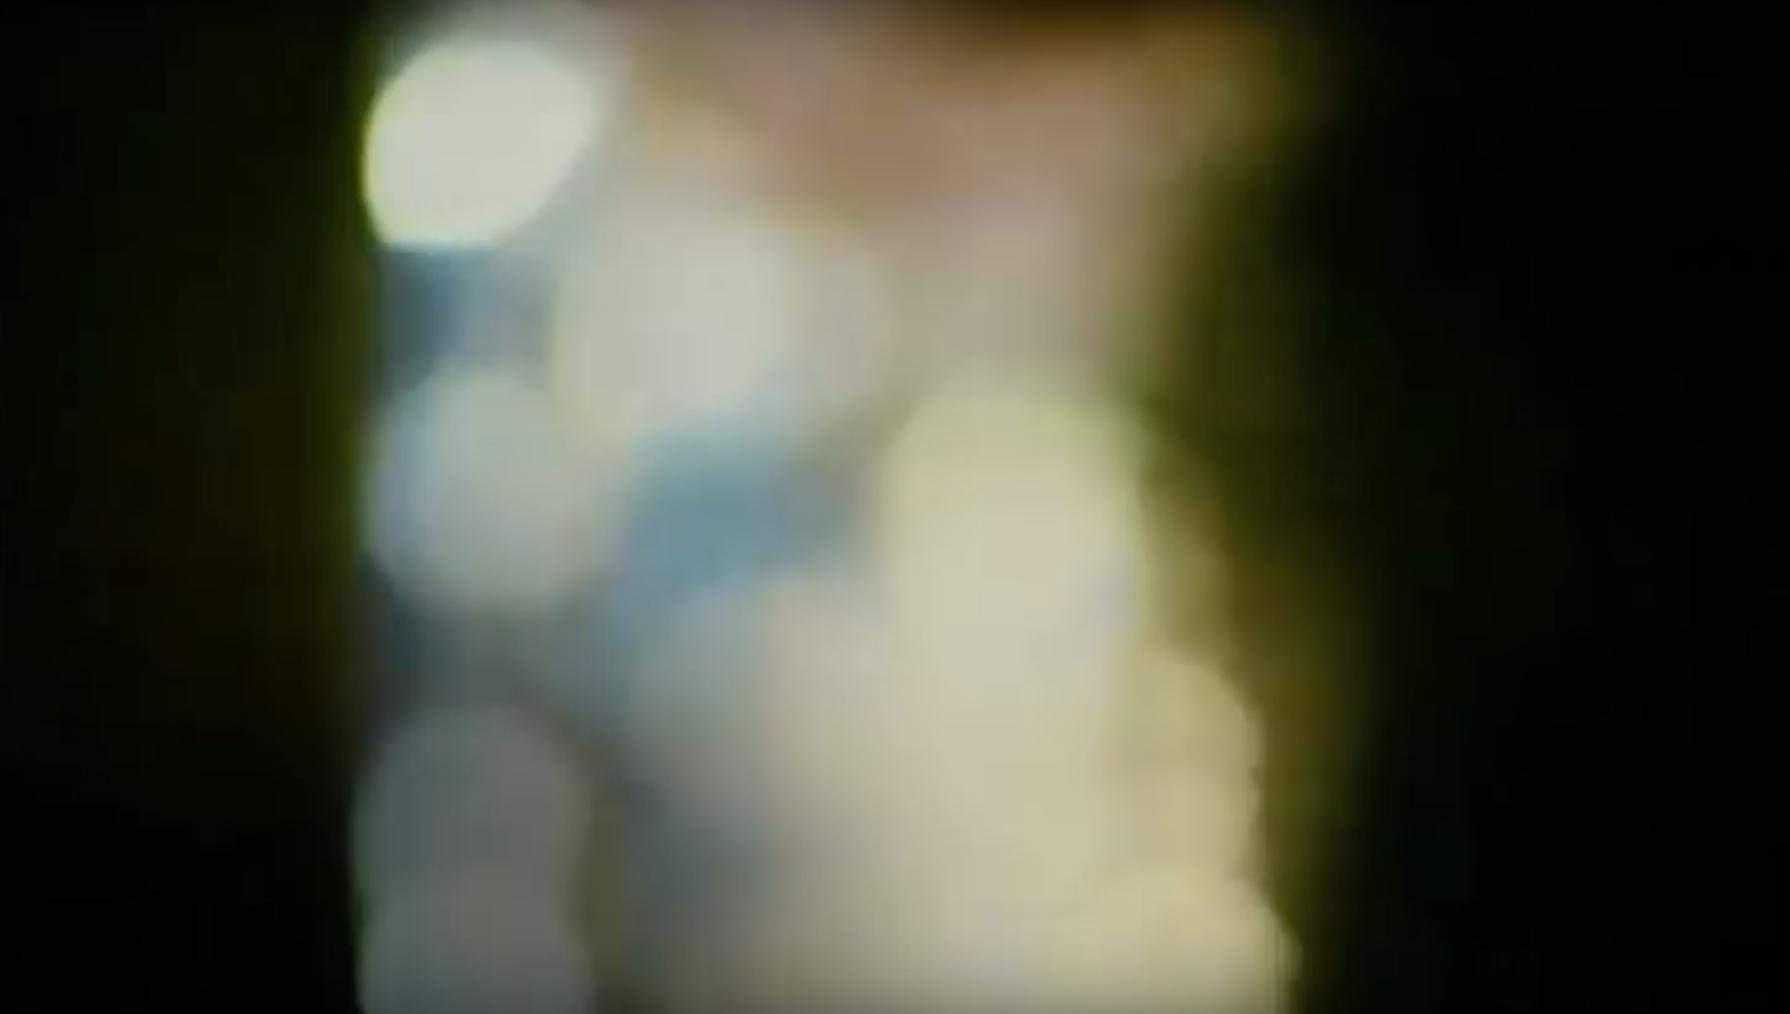 Transparent - opening credits